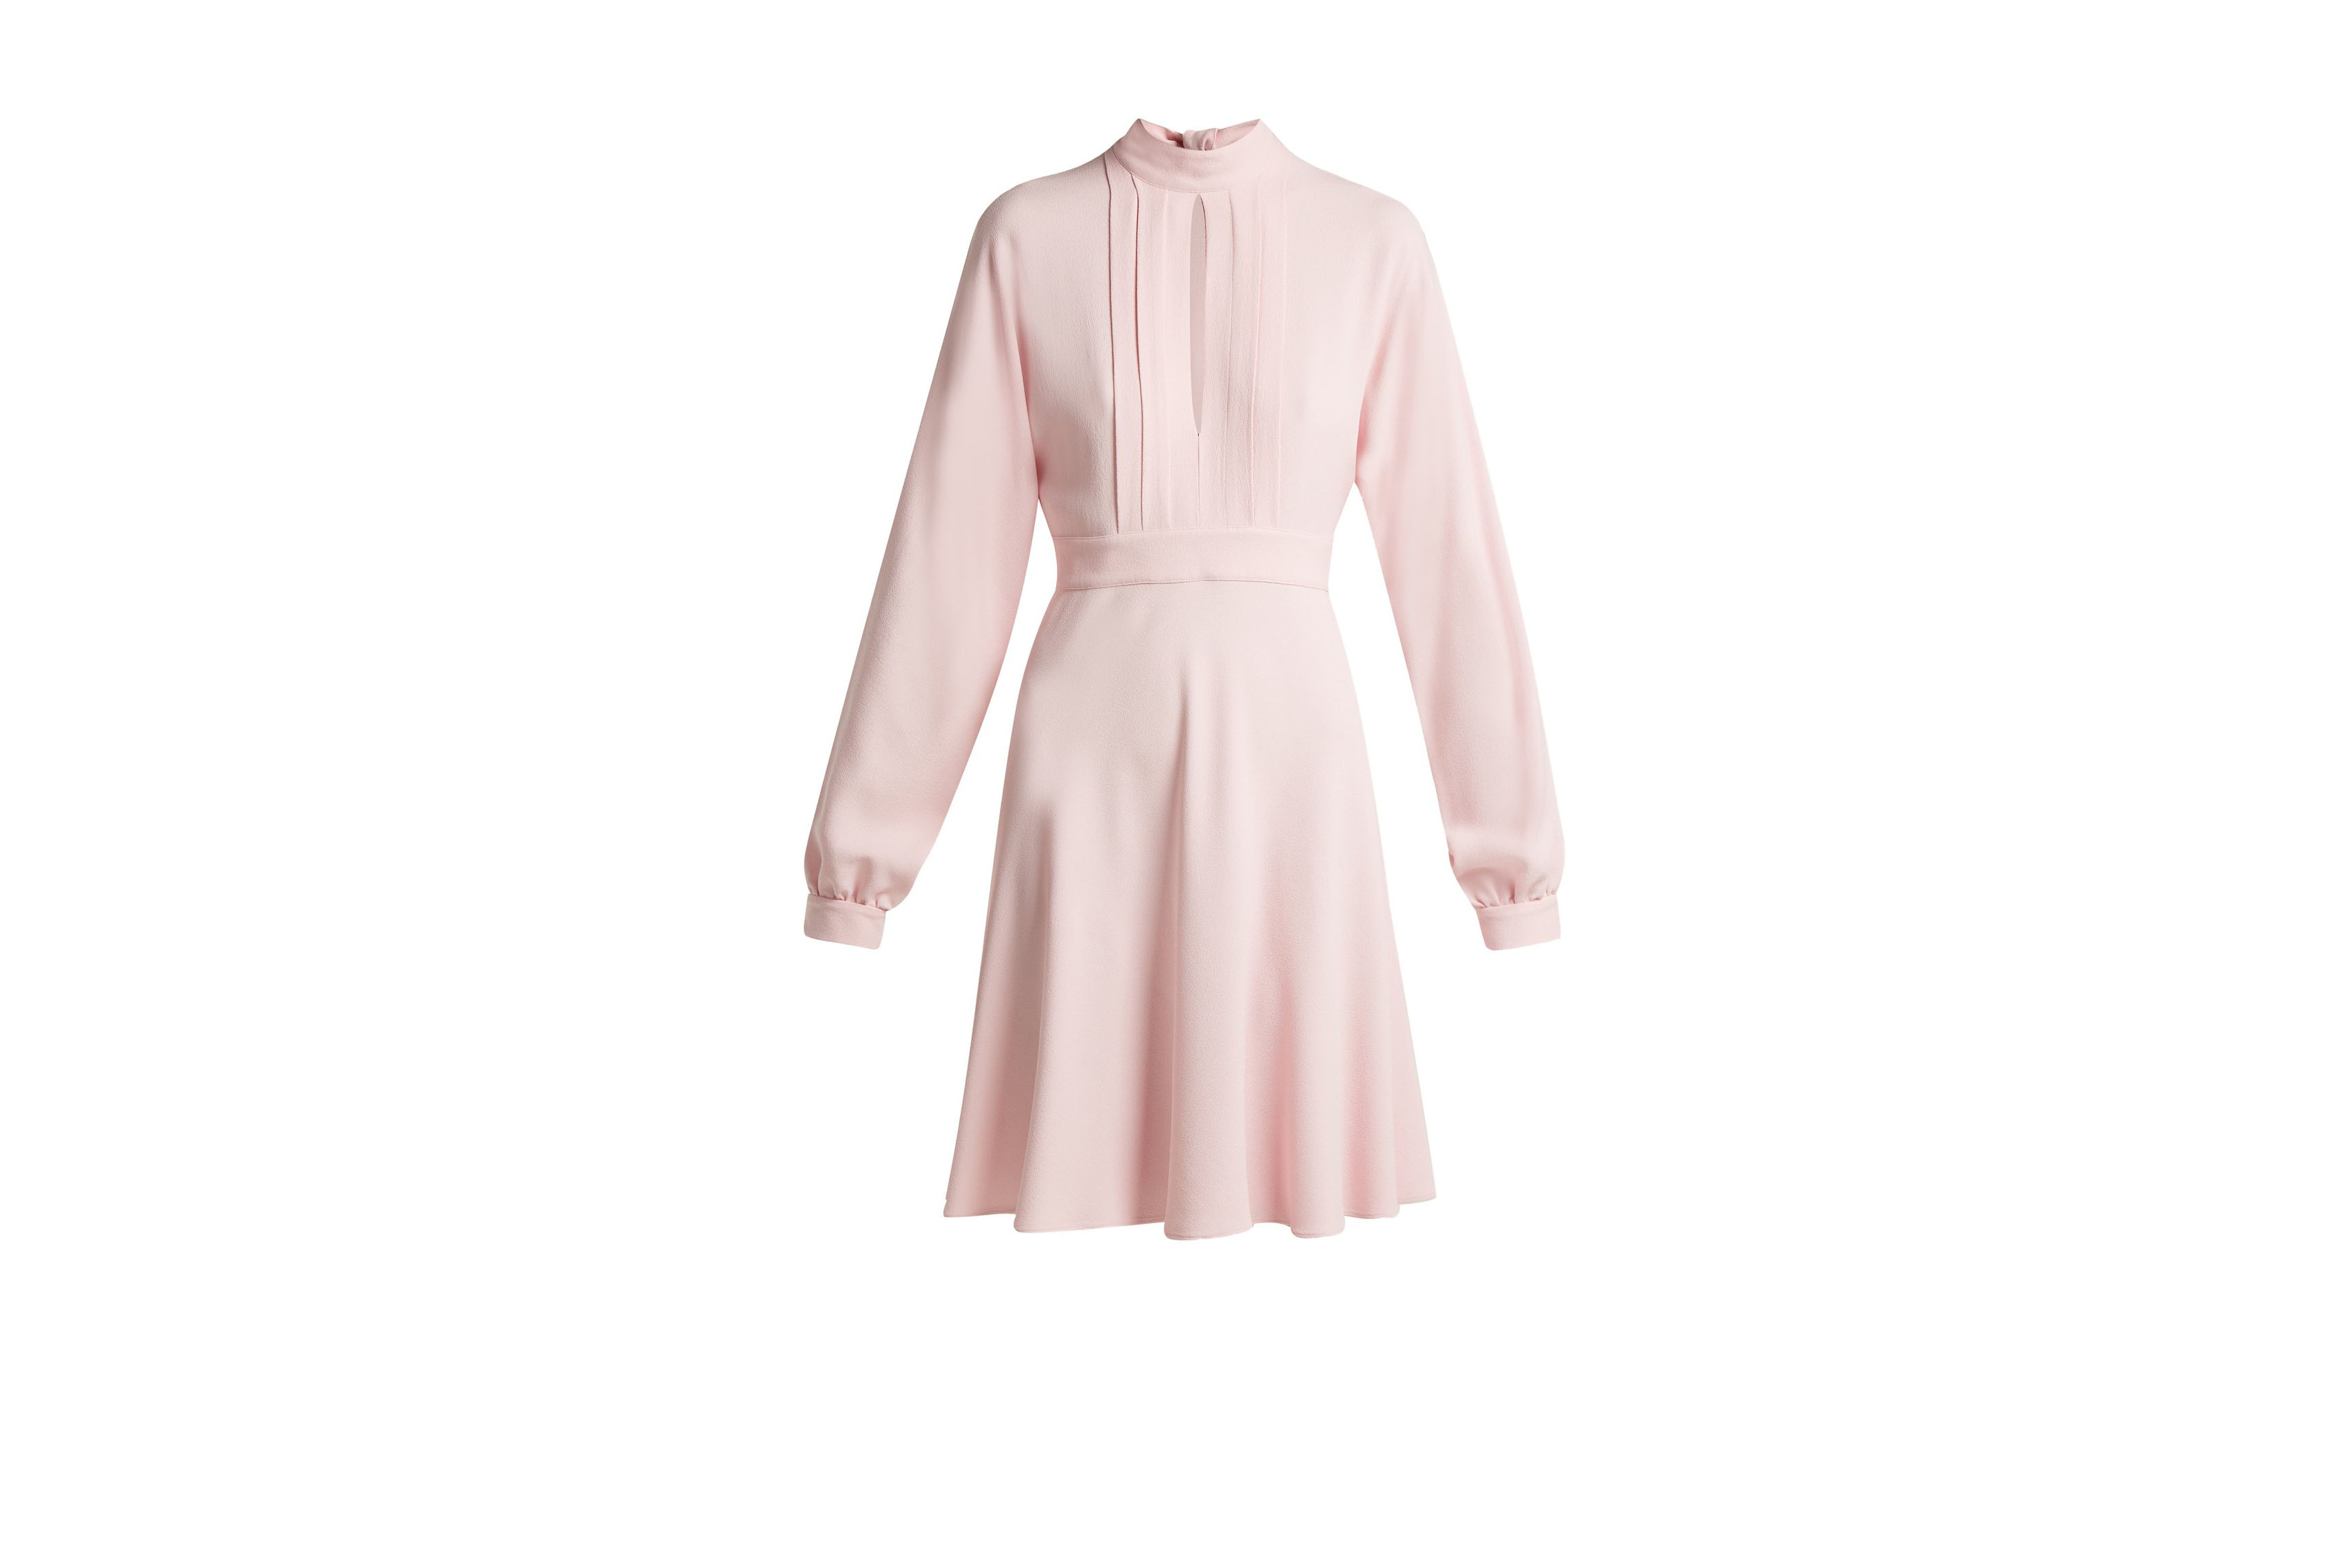 GIAMBATTISTA VALLI baby pink keyhole crepe dress